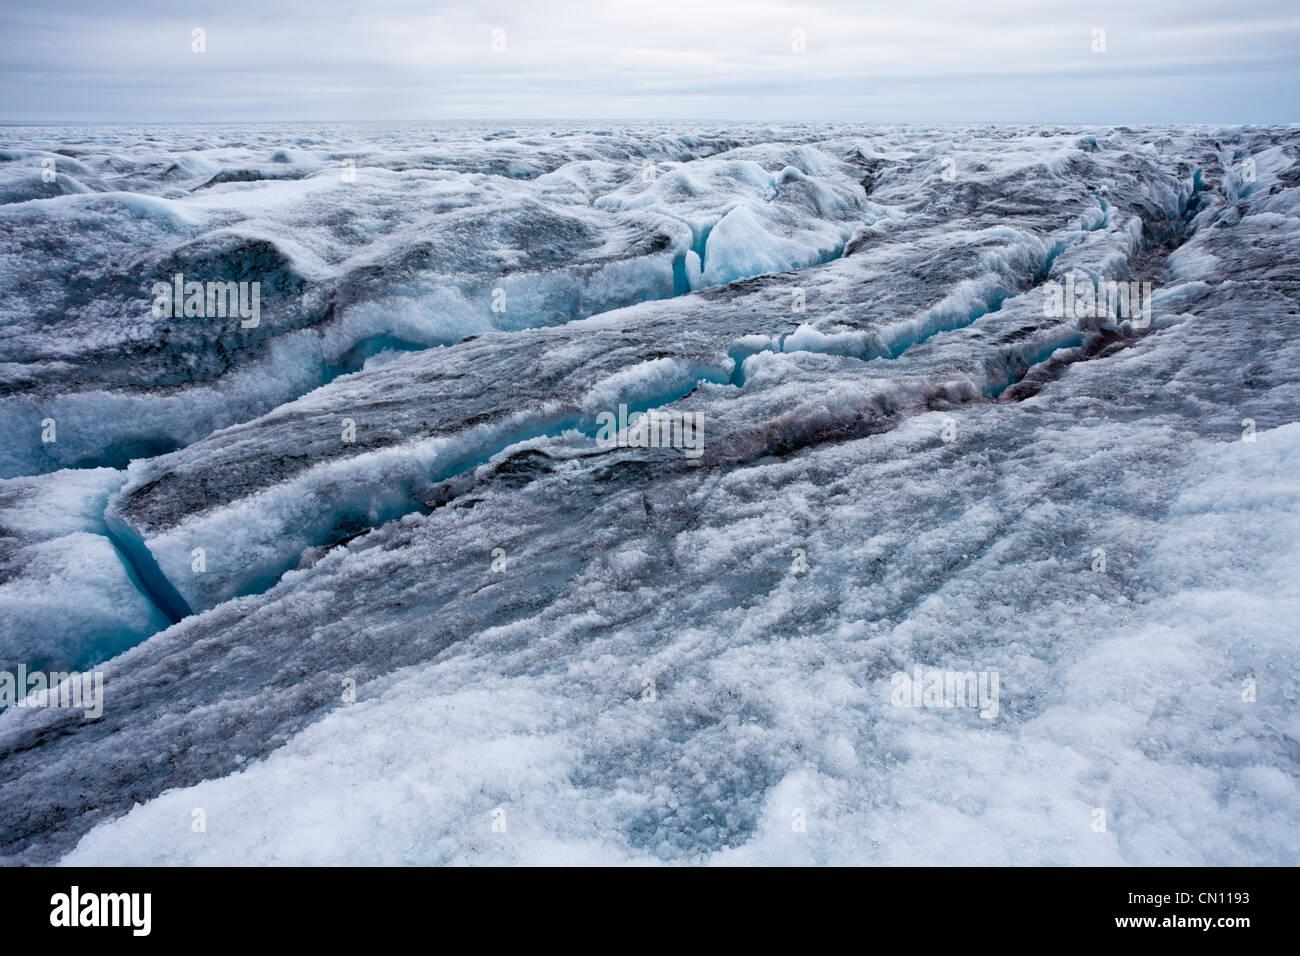 Crevassed glacier icecap arctic landscape in Greenland - Stock Image